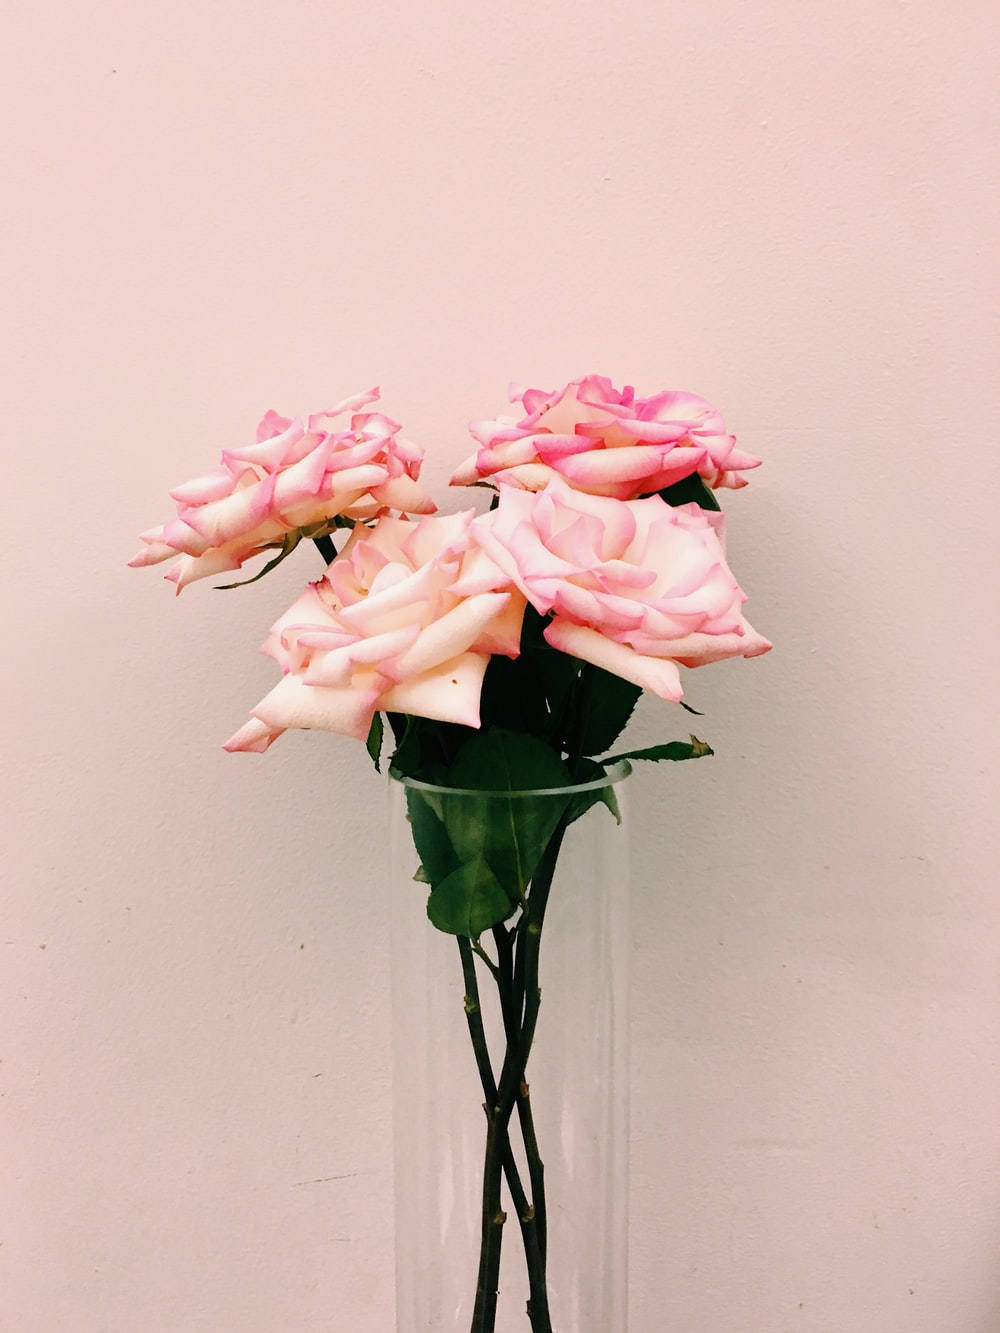 Pink White Flowers Photo By Jon Tyson Jontyson On Unsplash